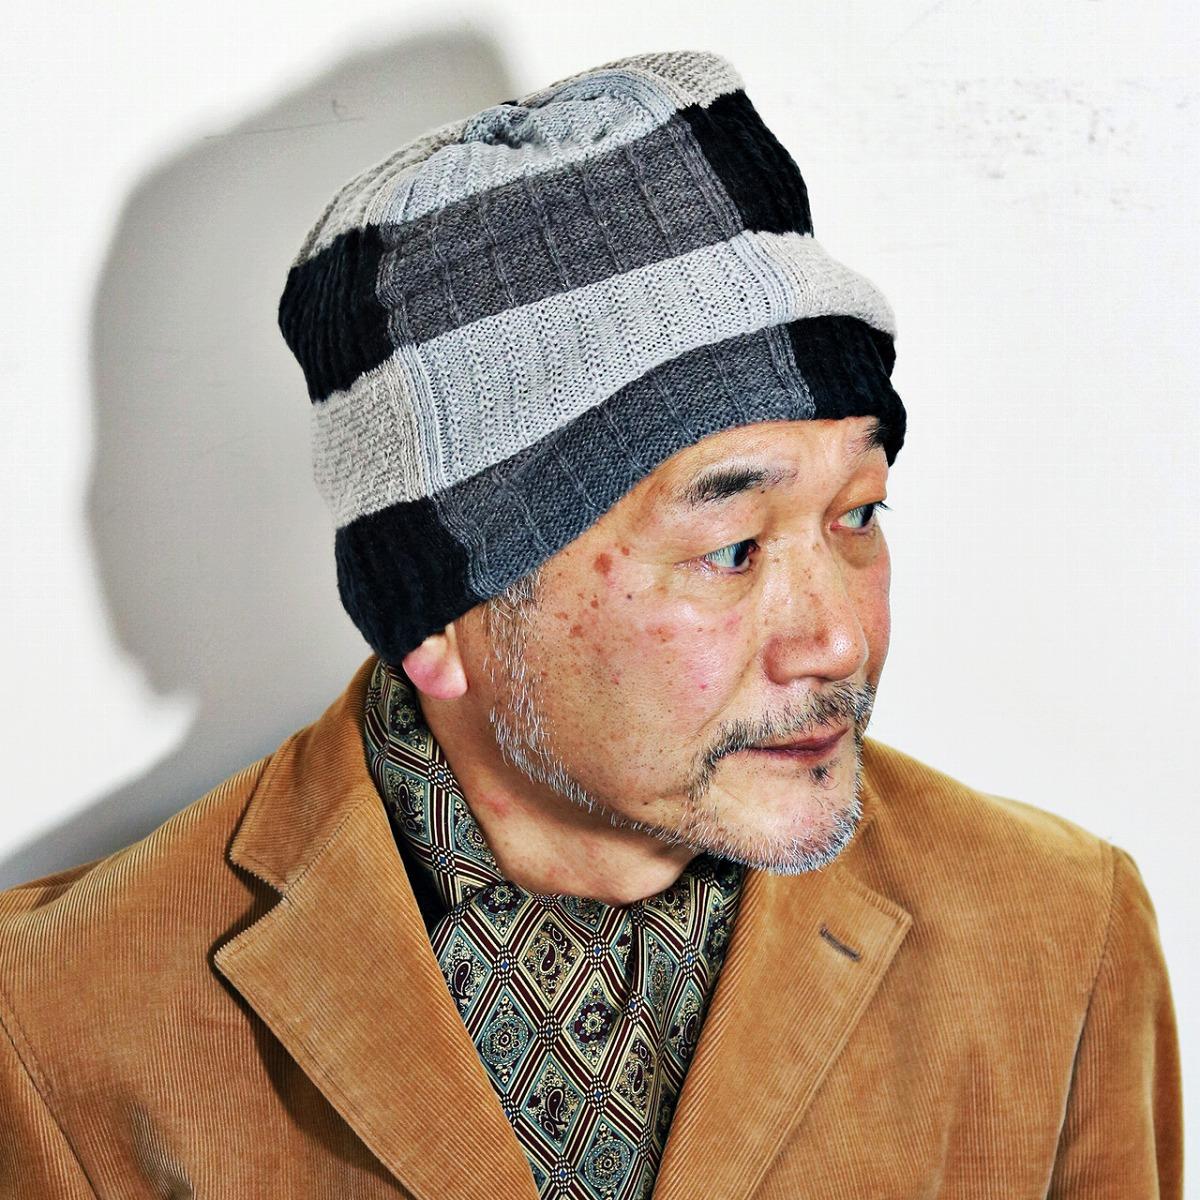 68136f0e149 Knit Cap patchwork Shon Hat cable knit hair mixed Kamon autumn winter men s  mix knit Womens mila schon Beanie men s fashion casual black beanie cap ...